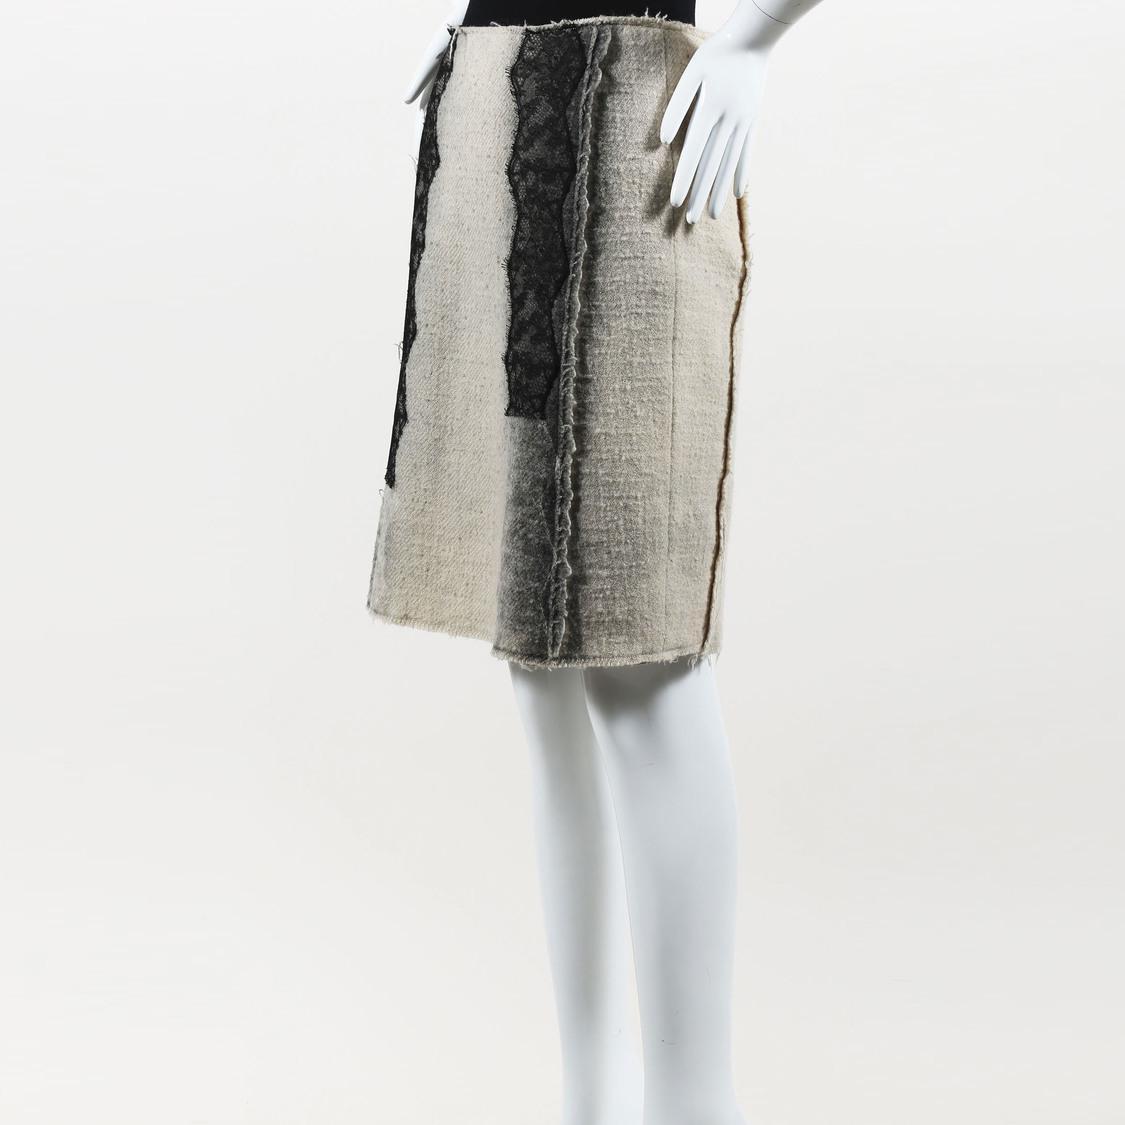 dd2cc9b2f3 Bottega Veneta Cream   Black Wool   Hemp Blend Lace Trimmed Pencil ...